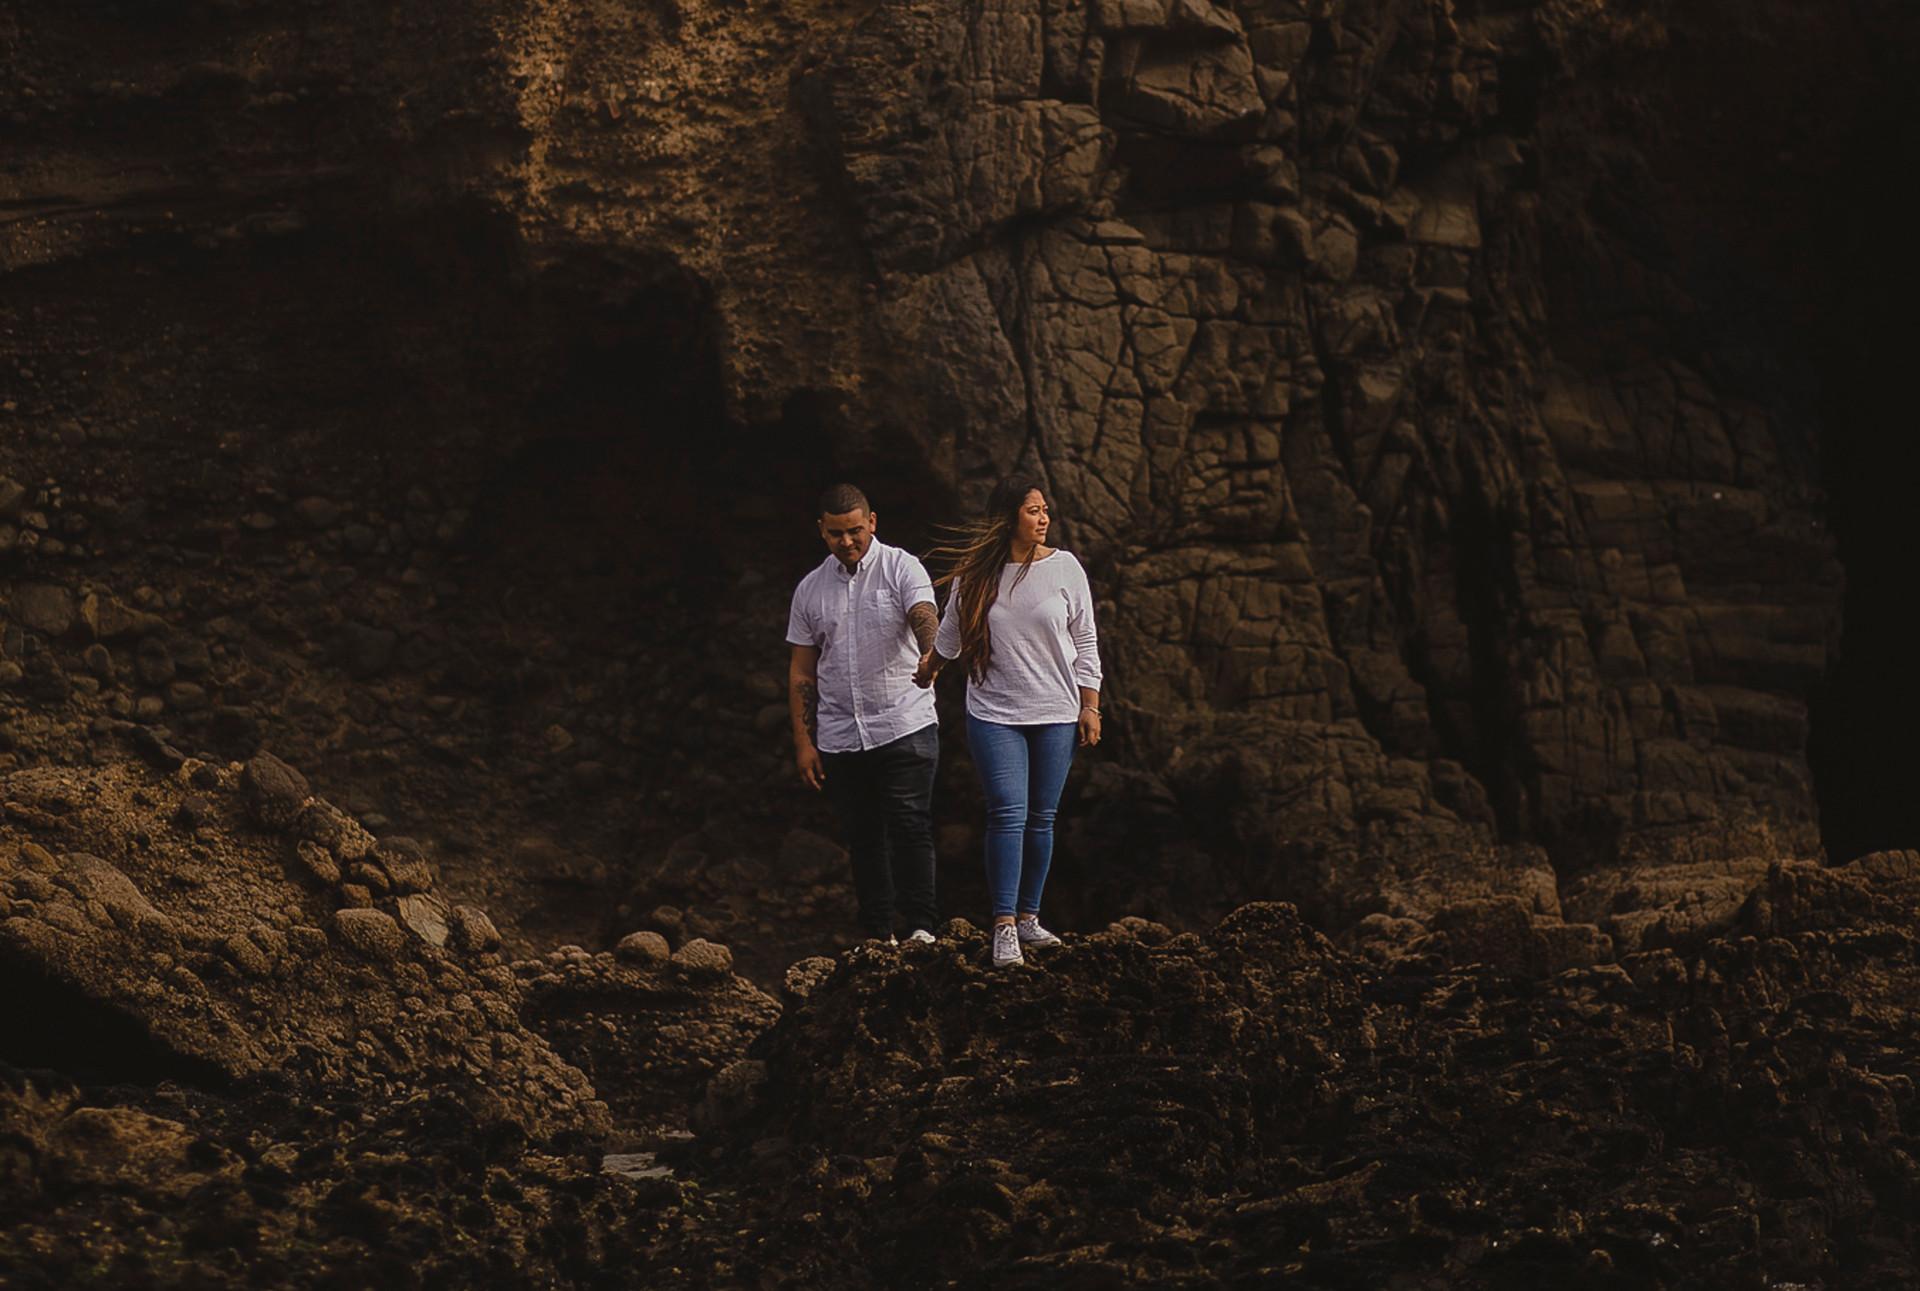 Rebecca & Tyrell / Love story